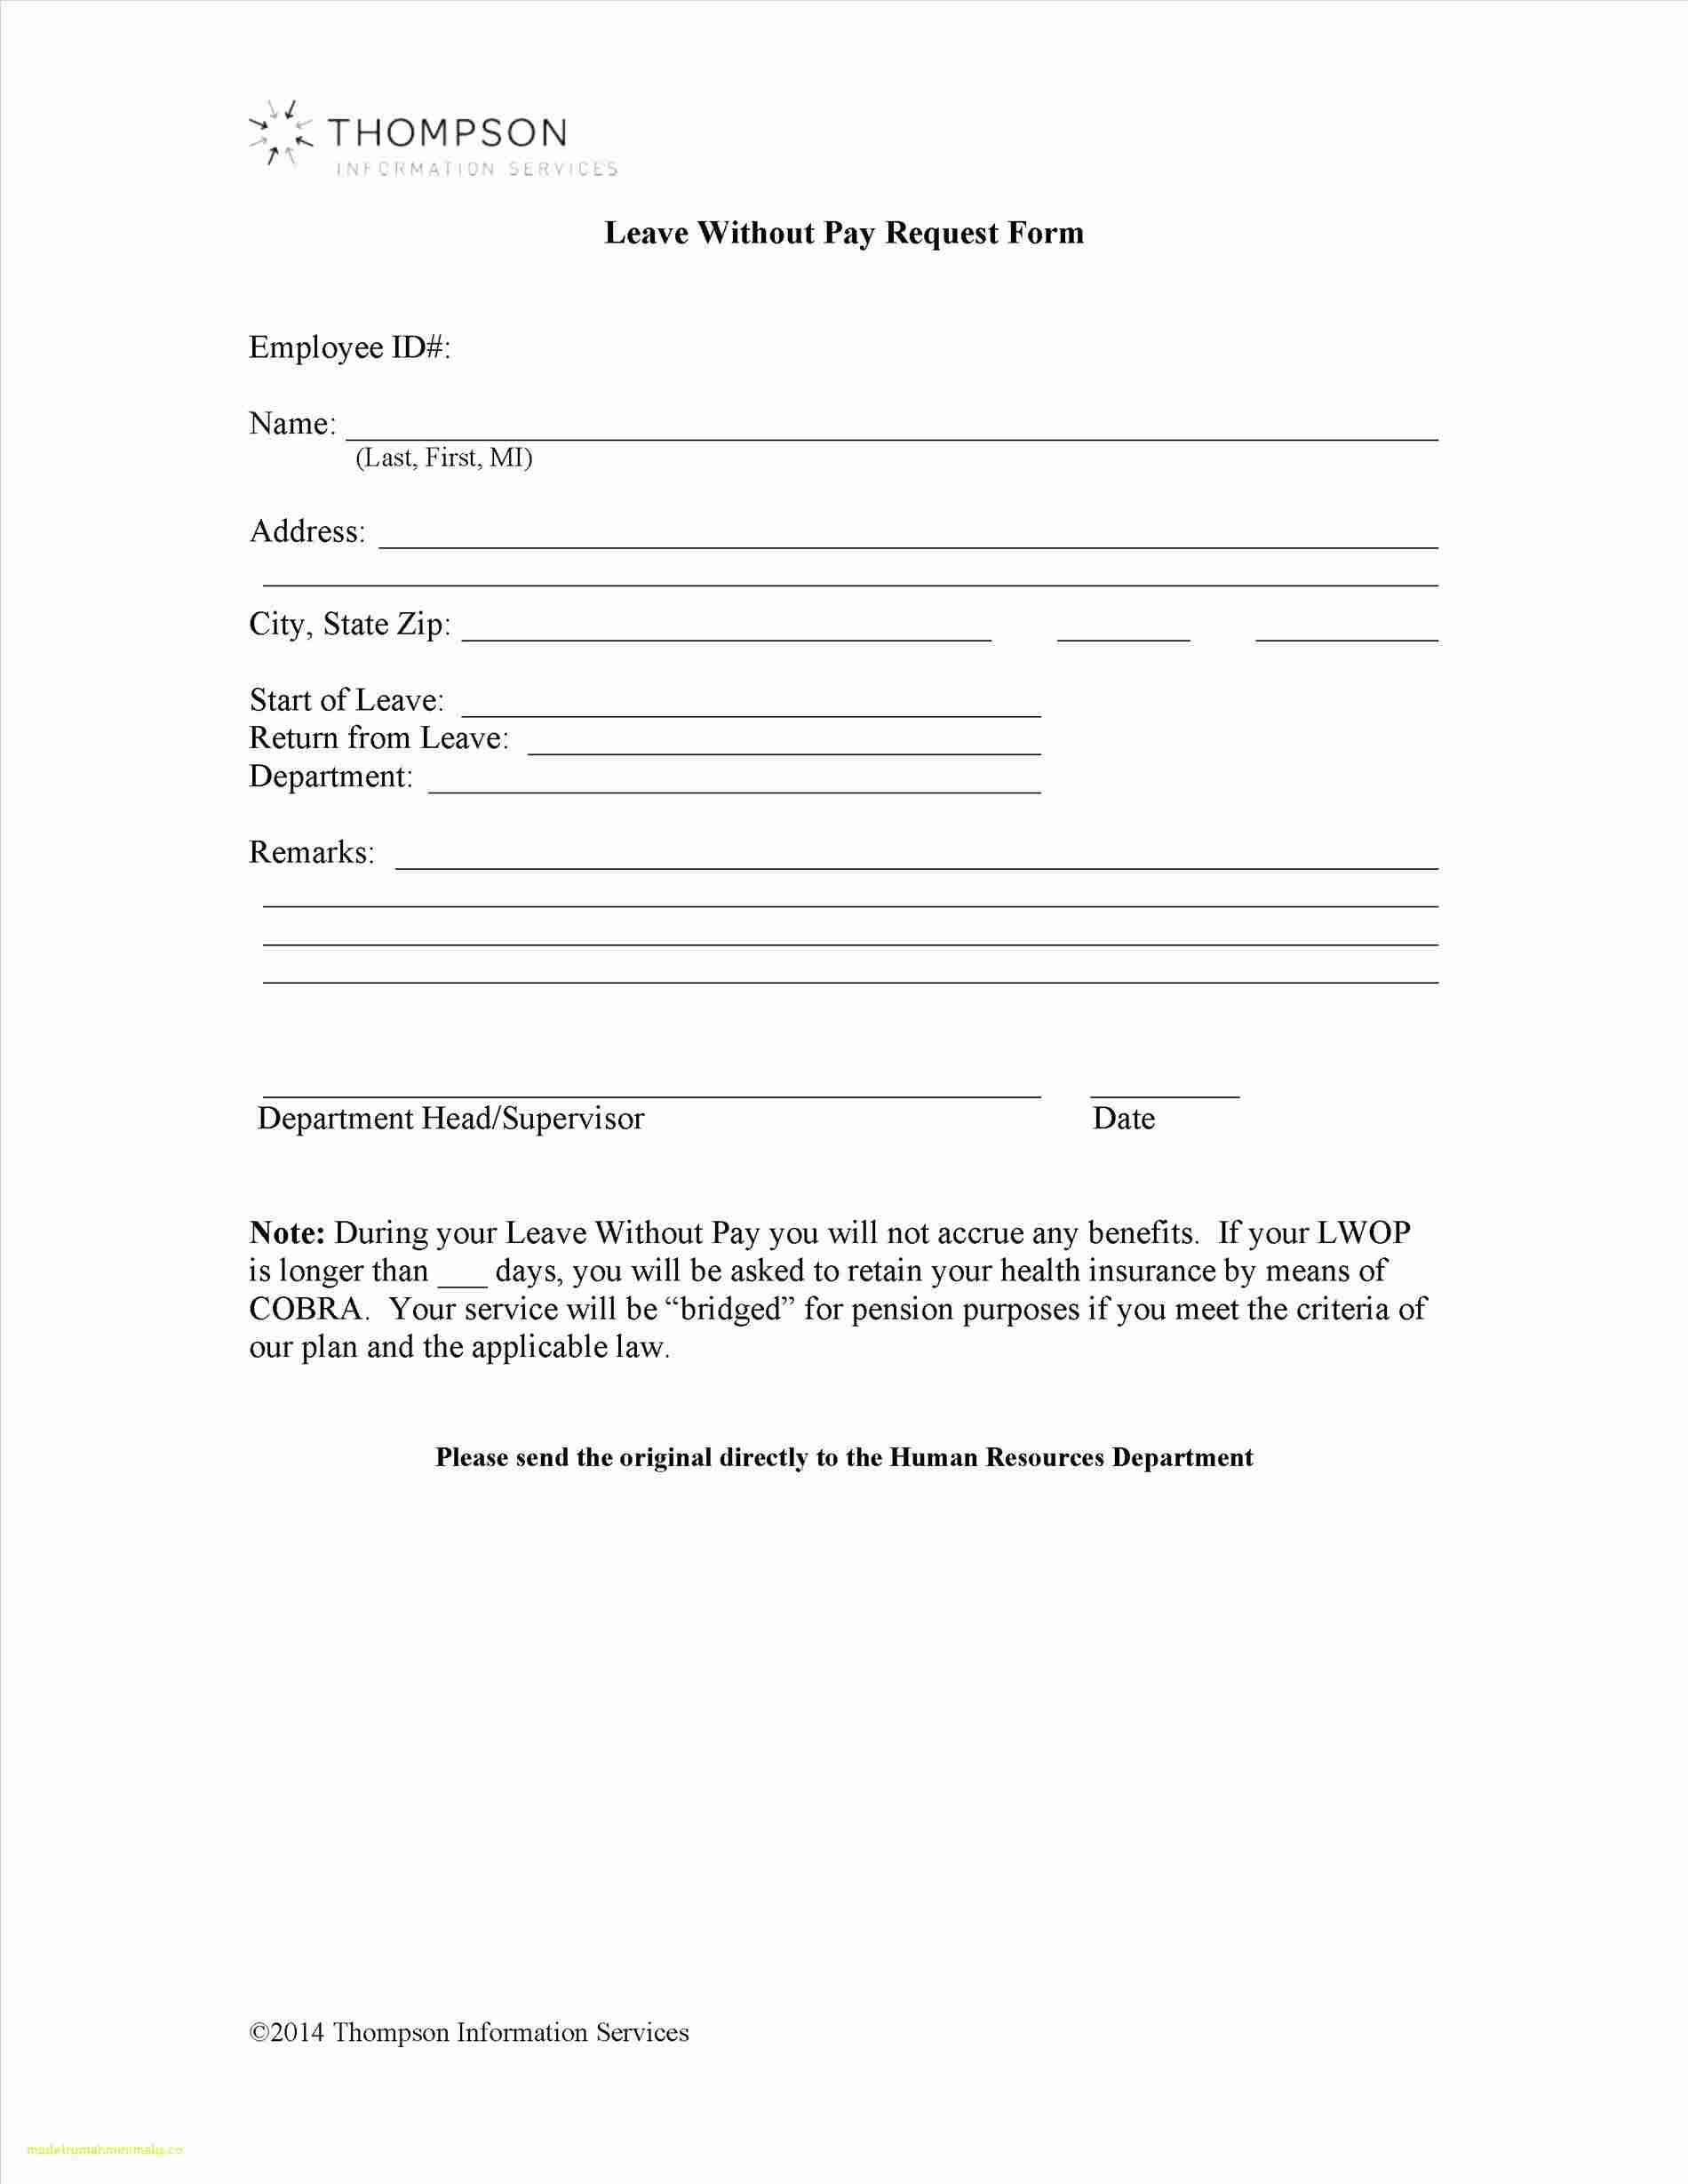 Composite Score Worksheet Usmc